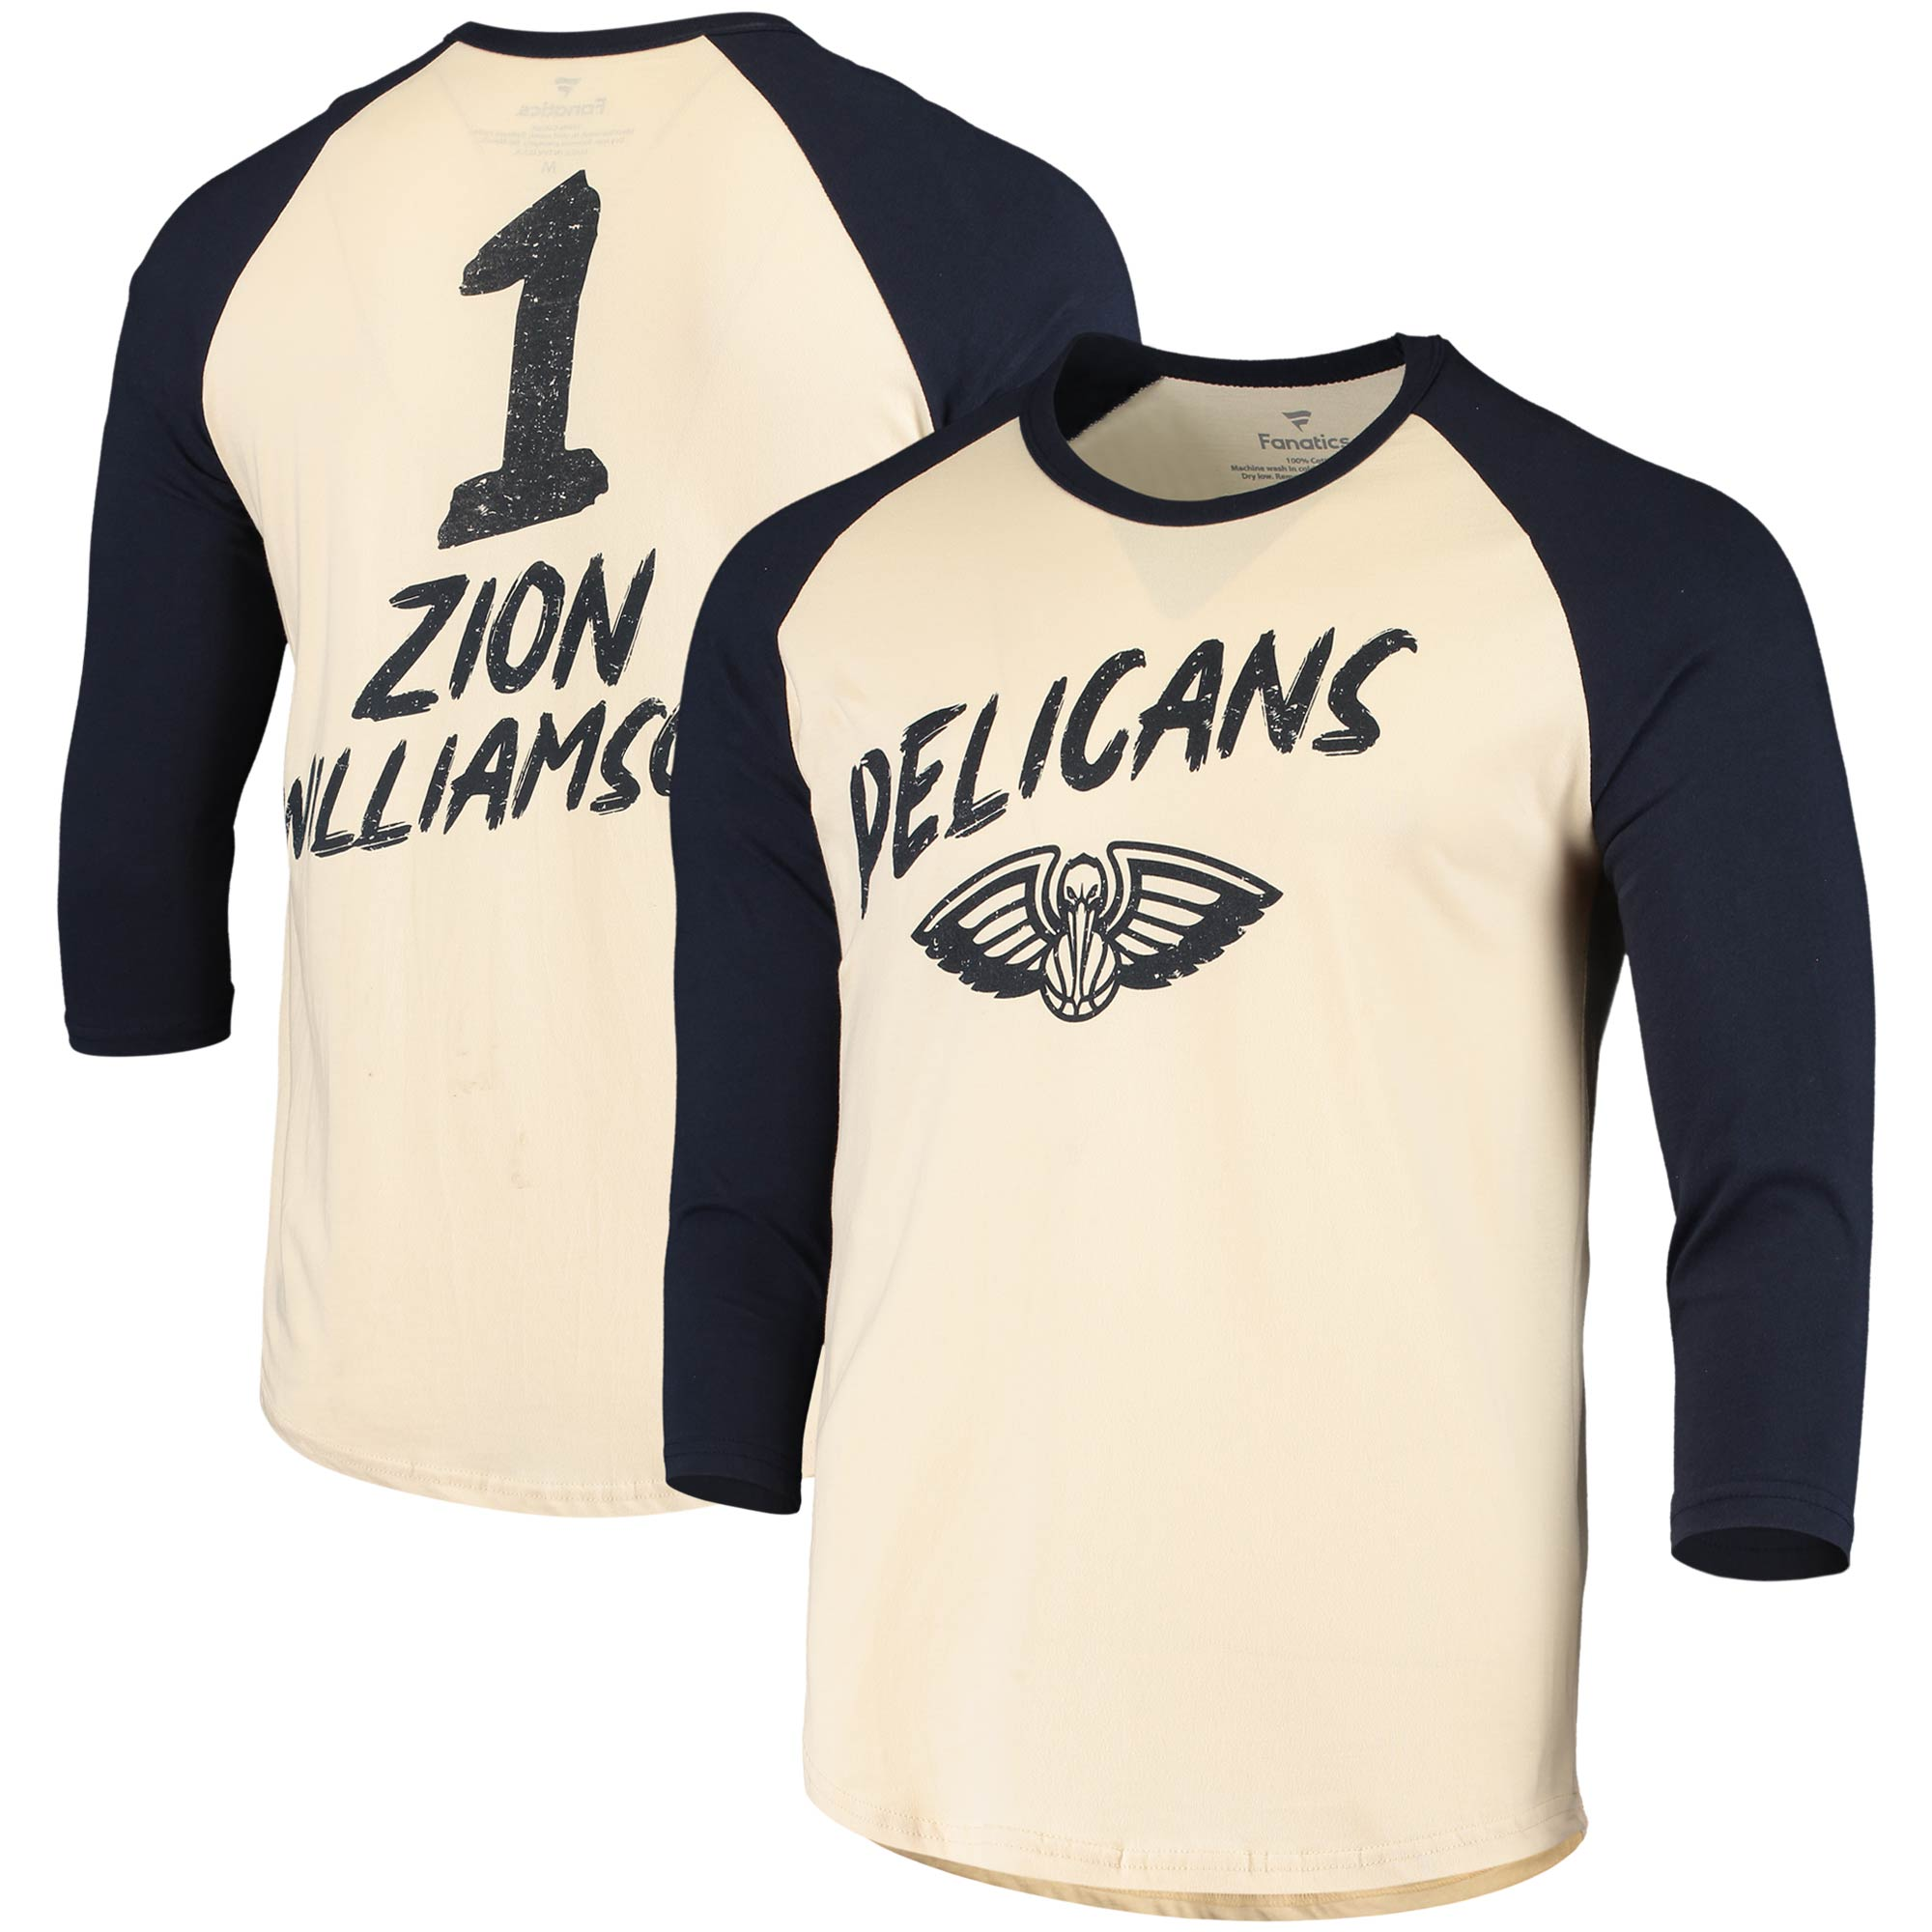 Zion Williamson New Orleans Pelicans Fanatics Branded Raglan 3/4 Sleeve T-Shirt - Cream/Navy